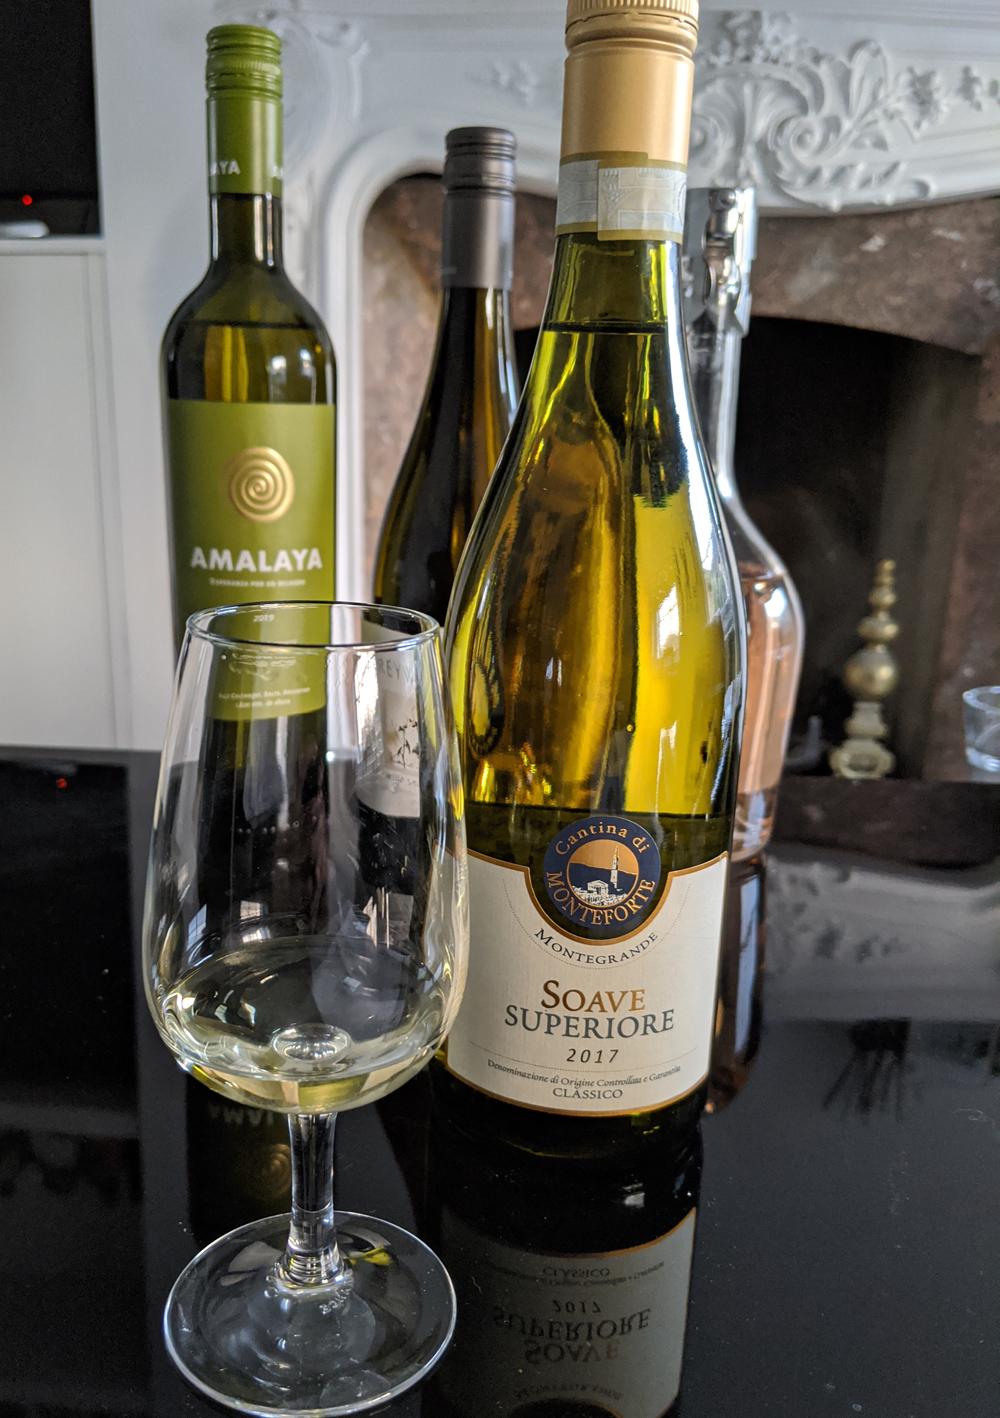 Wine Tasting - Soave Classico Montegrande